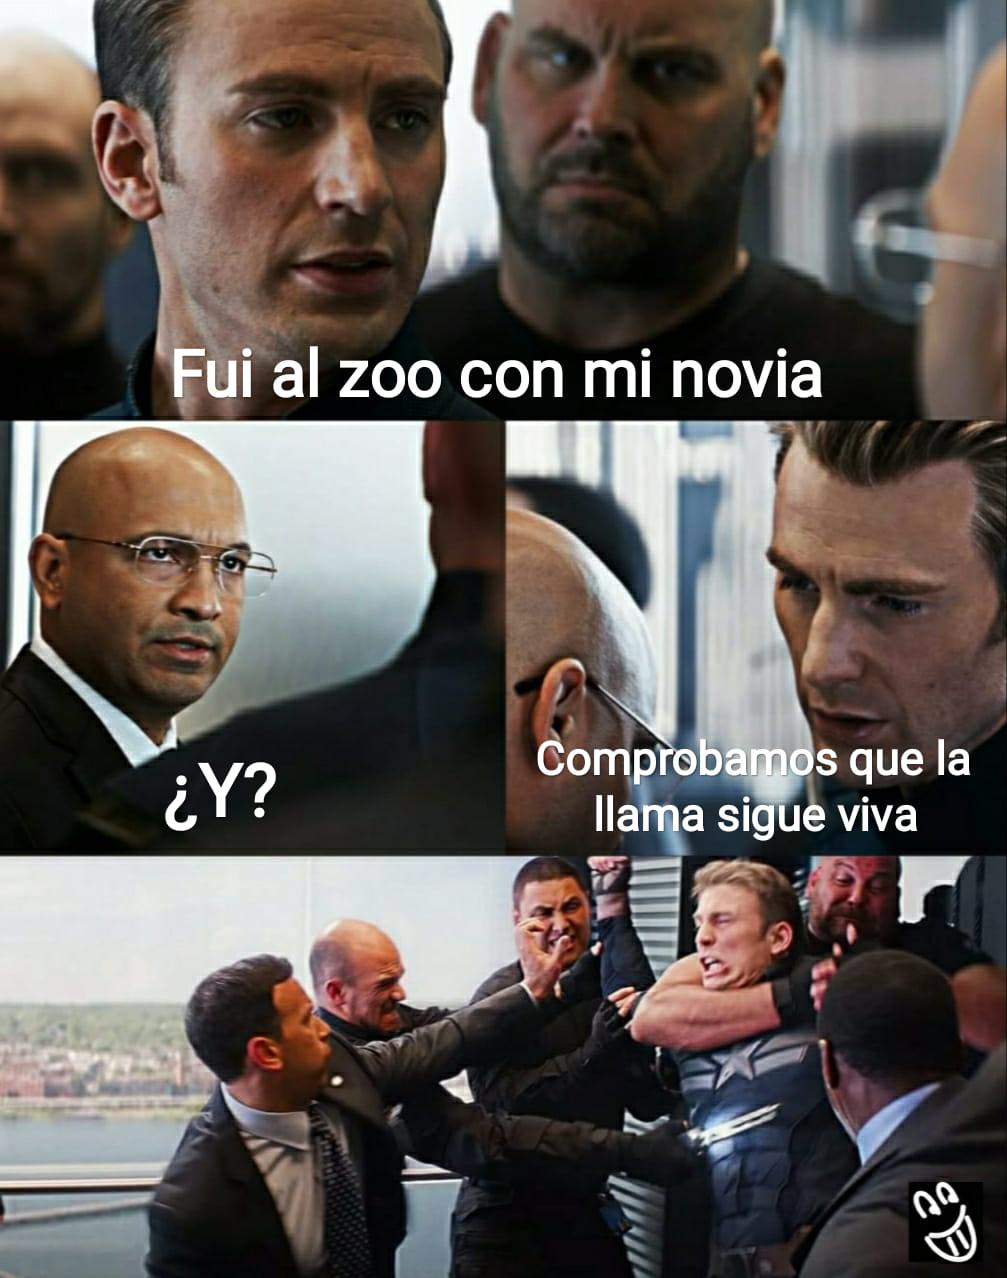 Meme Capitán América Zoo novia llama